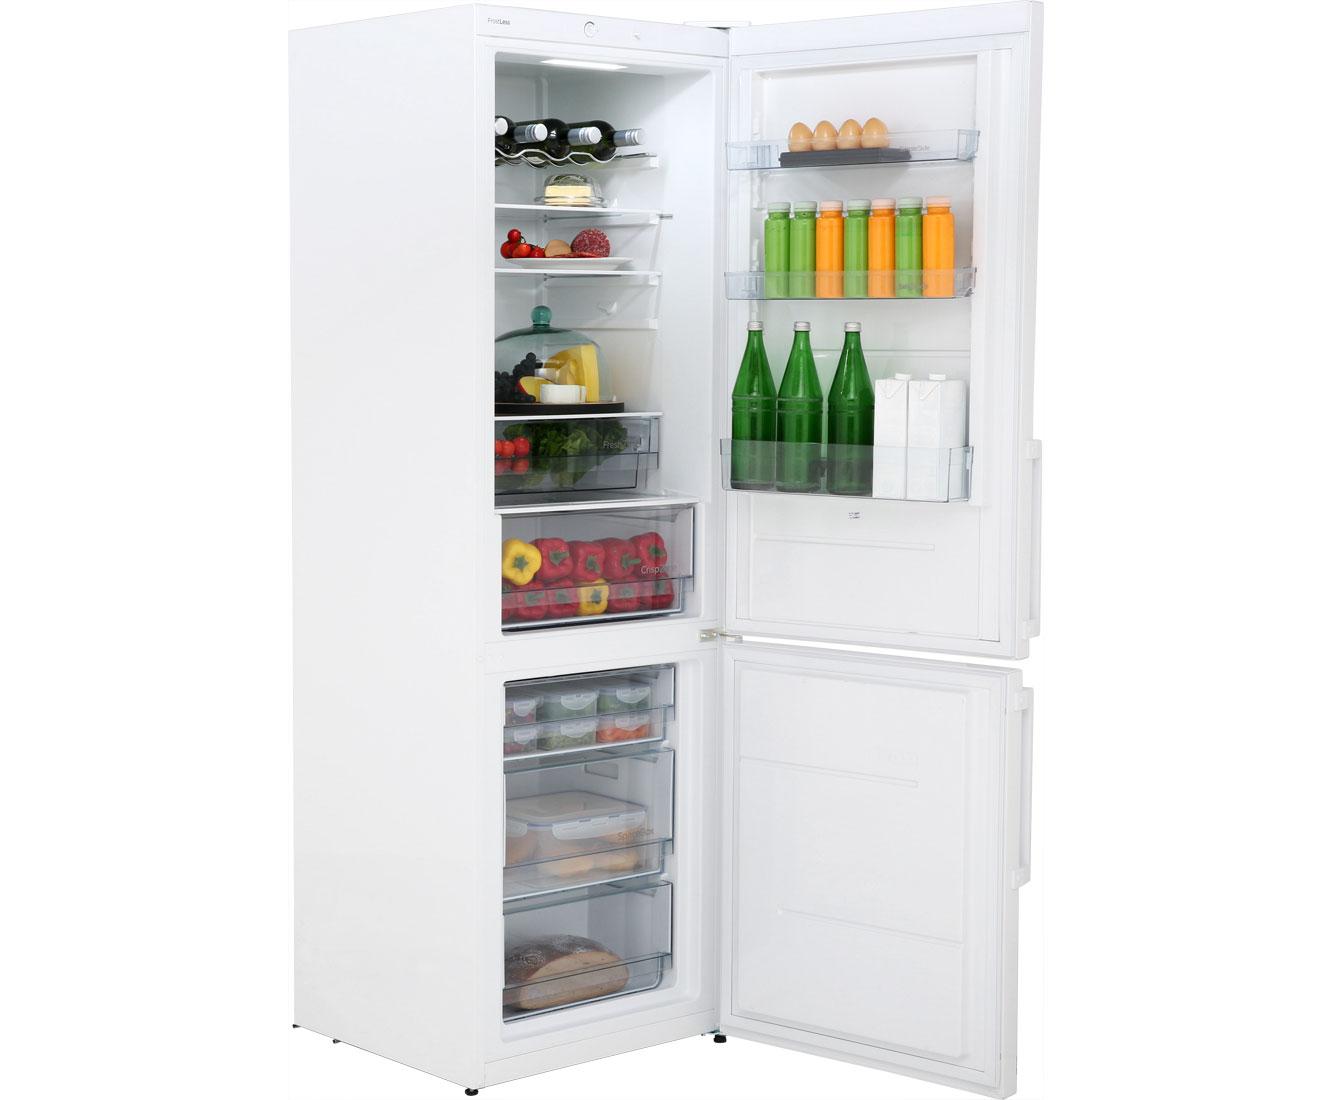 Gorenje Kühlschrank Nrki4182gw : Gorenje kühl gefrierkombination kühlschrank modelle